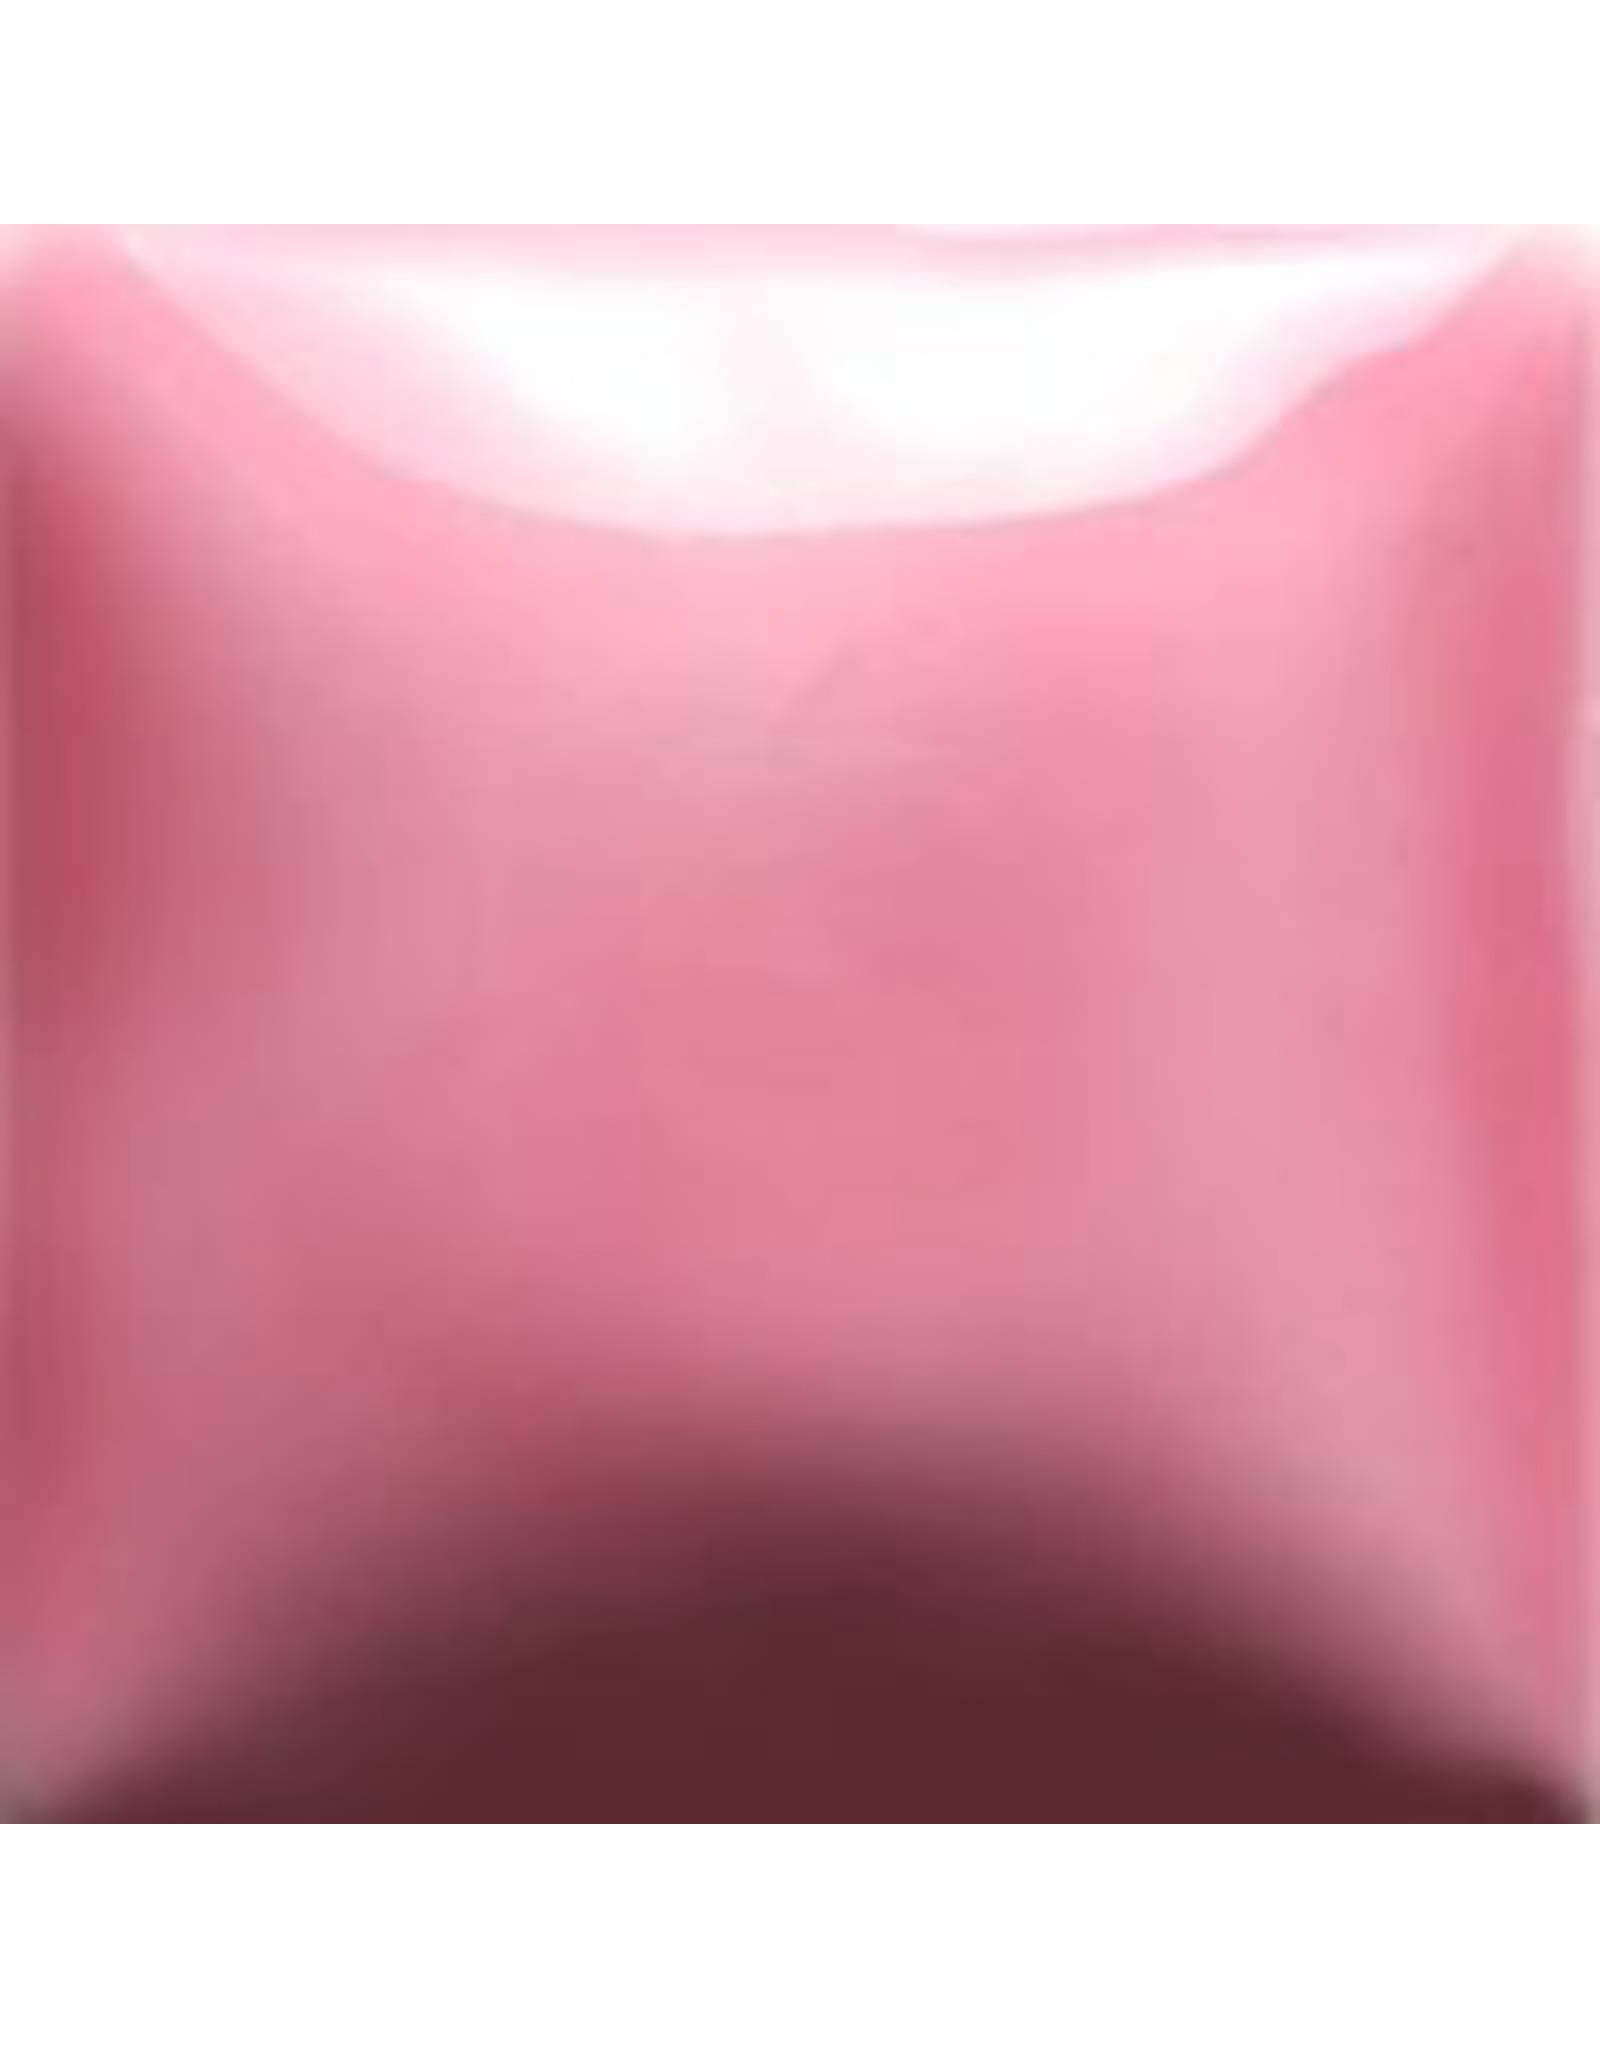 Mayco Mayco Foundations Bright Pink - 473ml